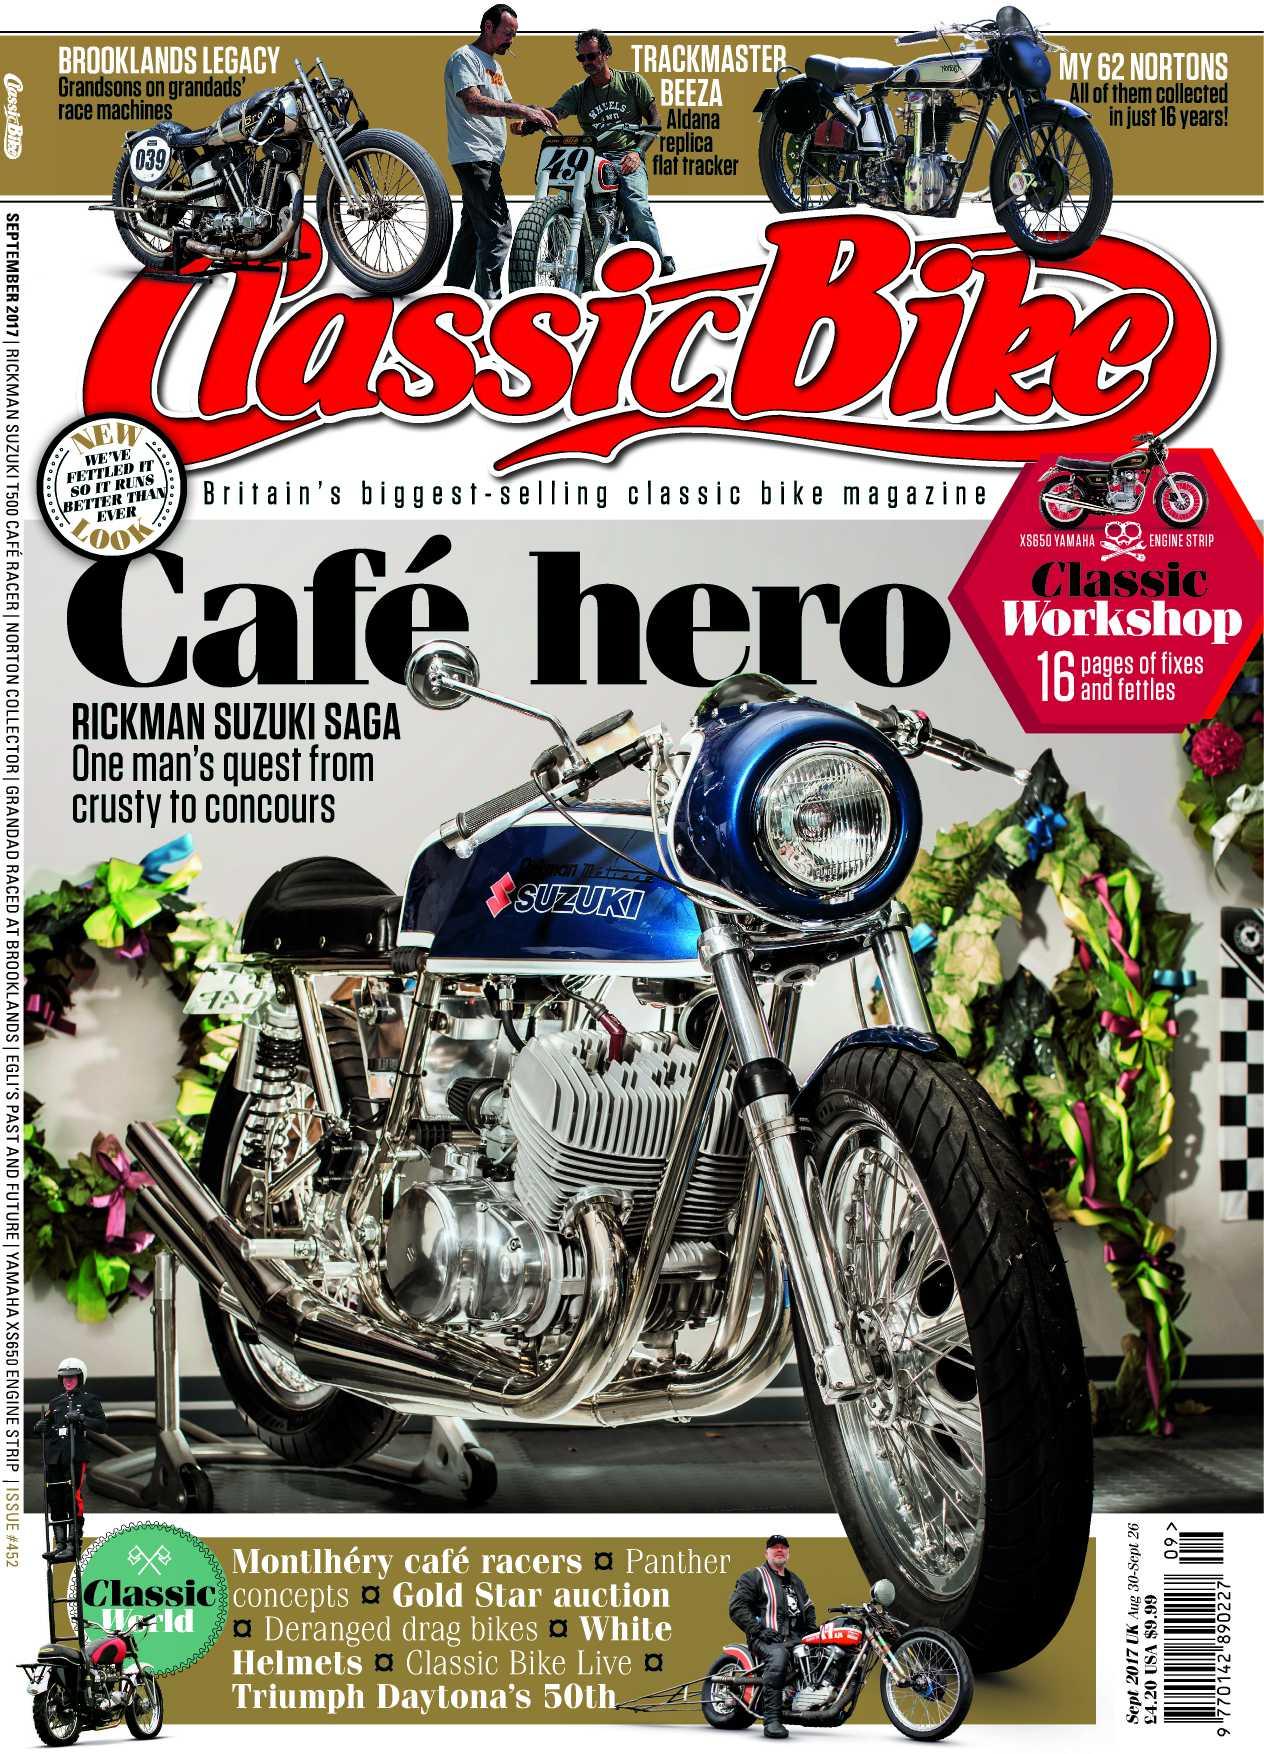 Classic Bike magazine September 2017 issue